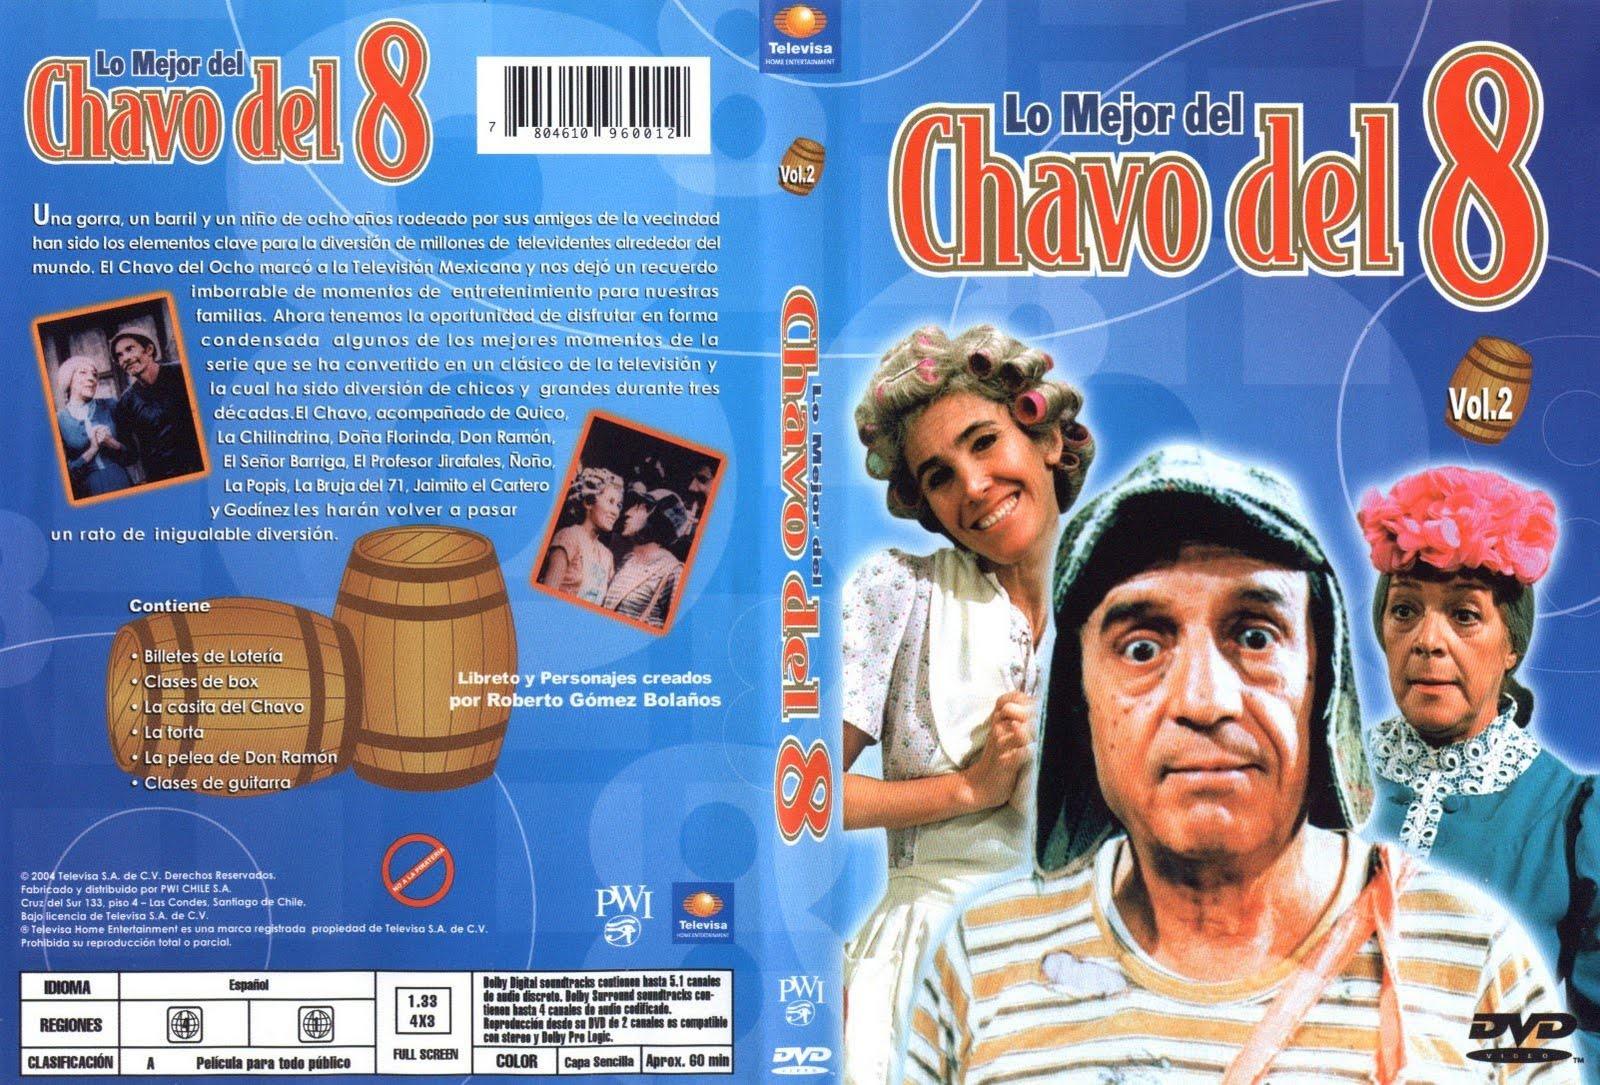 http://1.bp.blogspot.com/_Yo9jdb_UjCw/S85bBSfX8bI/AAAAAAAAABM/3ROIu2C2ZlM/s1600/Lo_Mejor_Del_Chavo_Del_8_Volumen_2_-_V2_por_uasc_%25255Bdvd%25255D_80.jpg